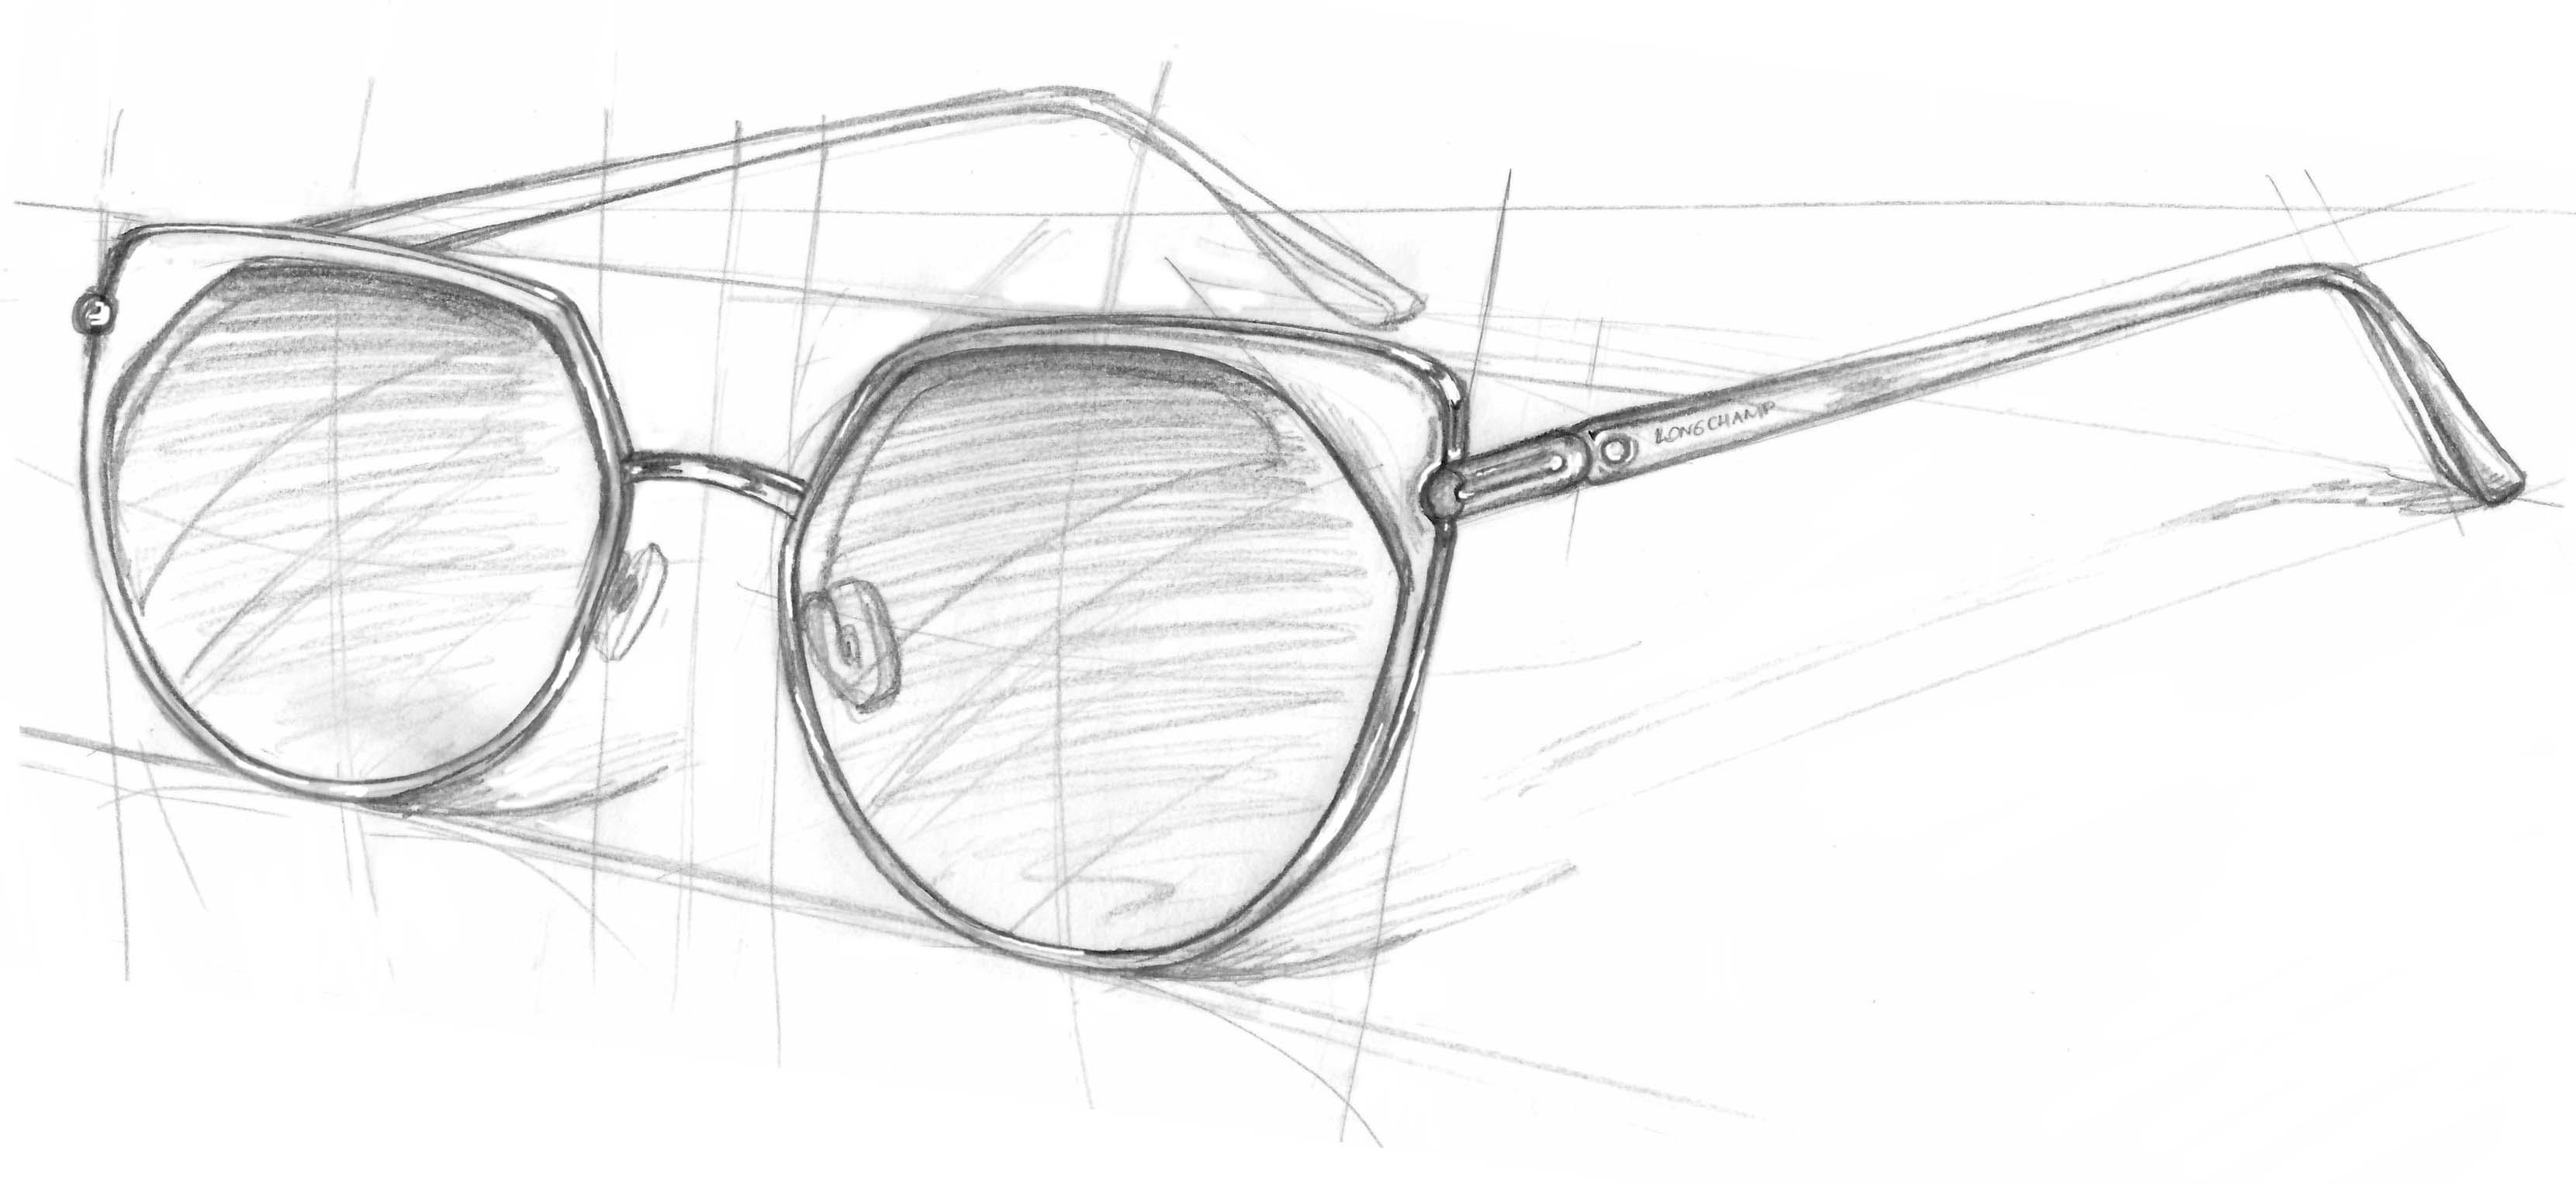 Longchamp selects Marchon to take part in global eyewear venture ...